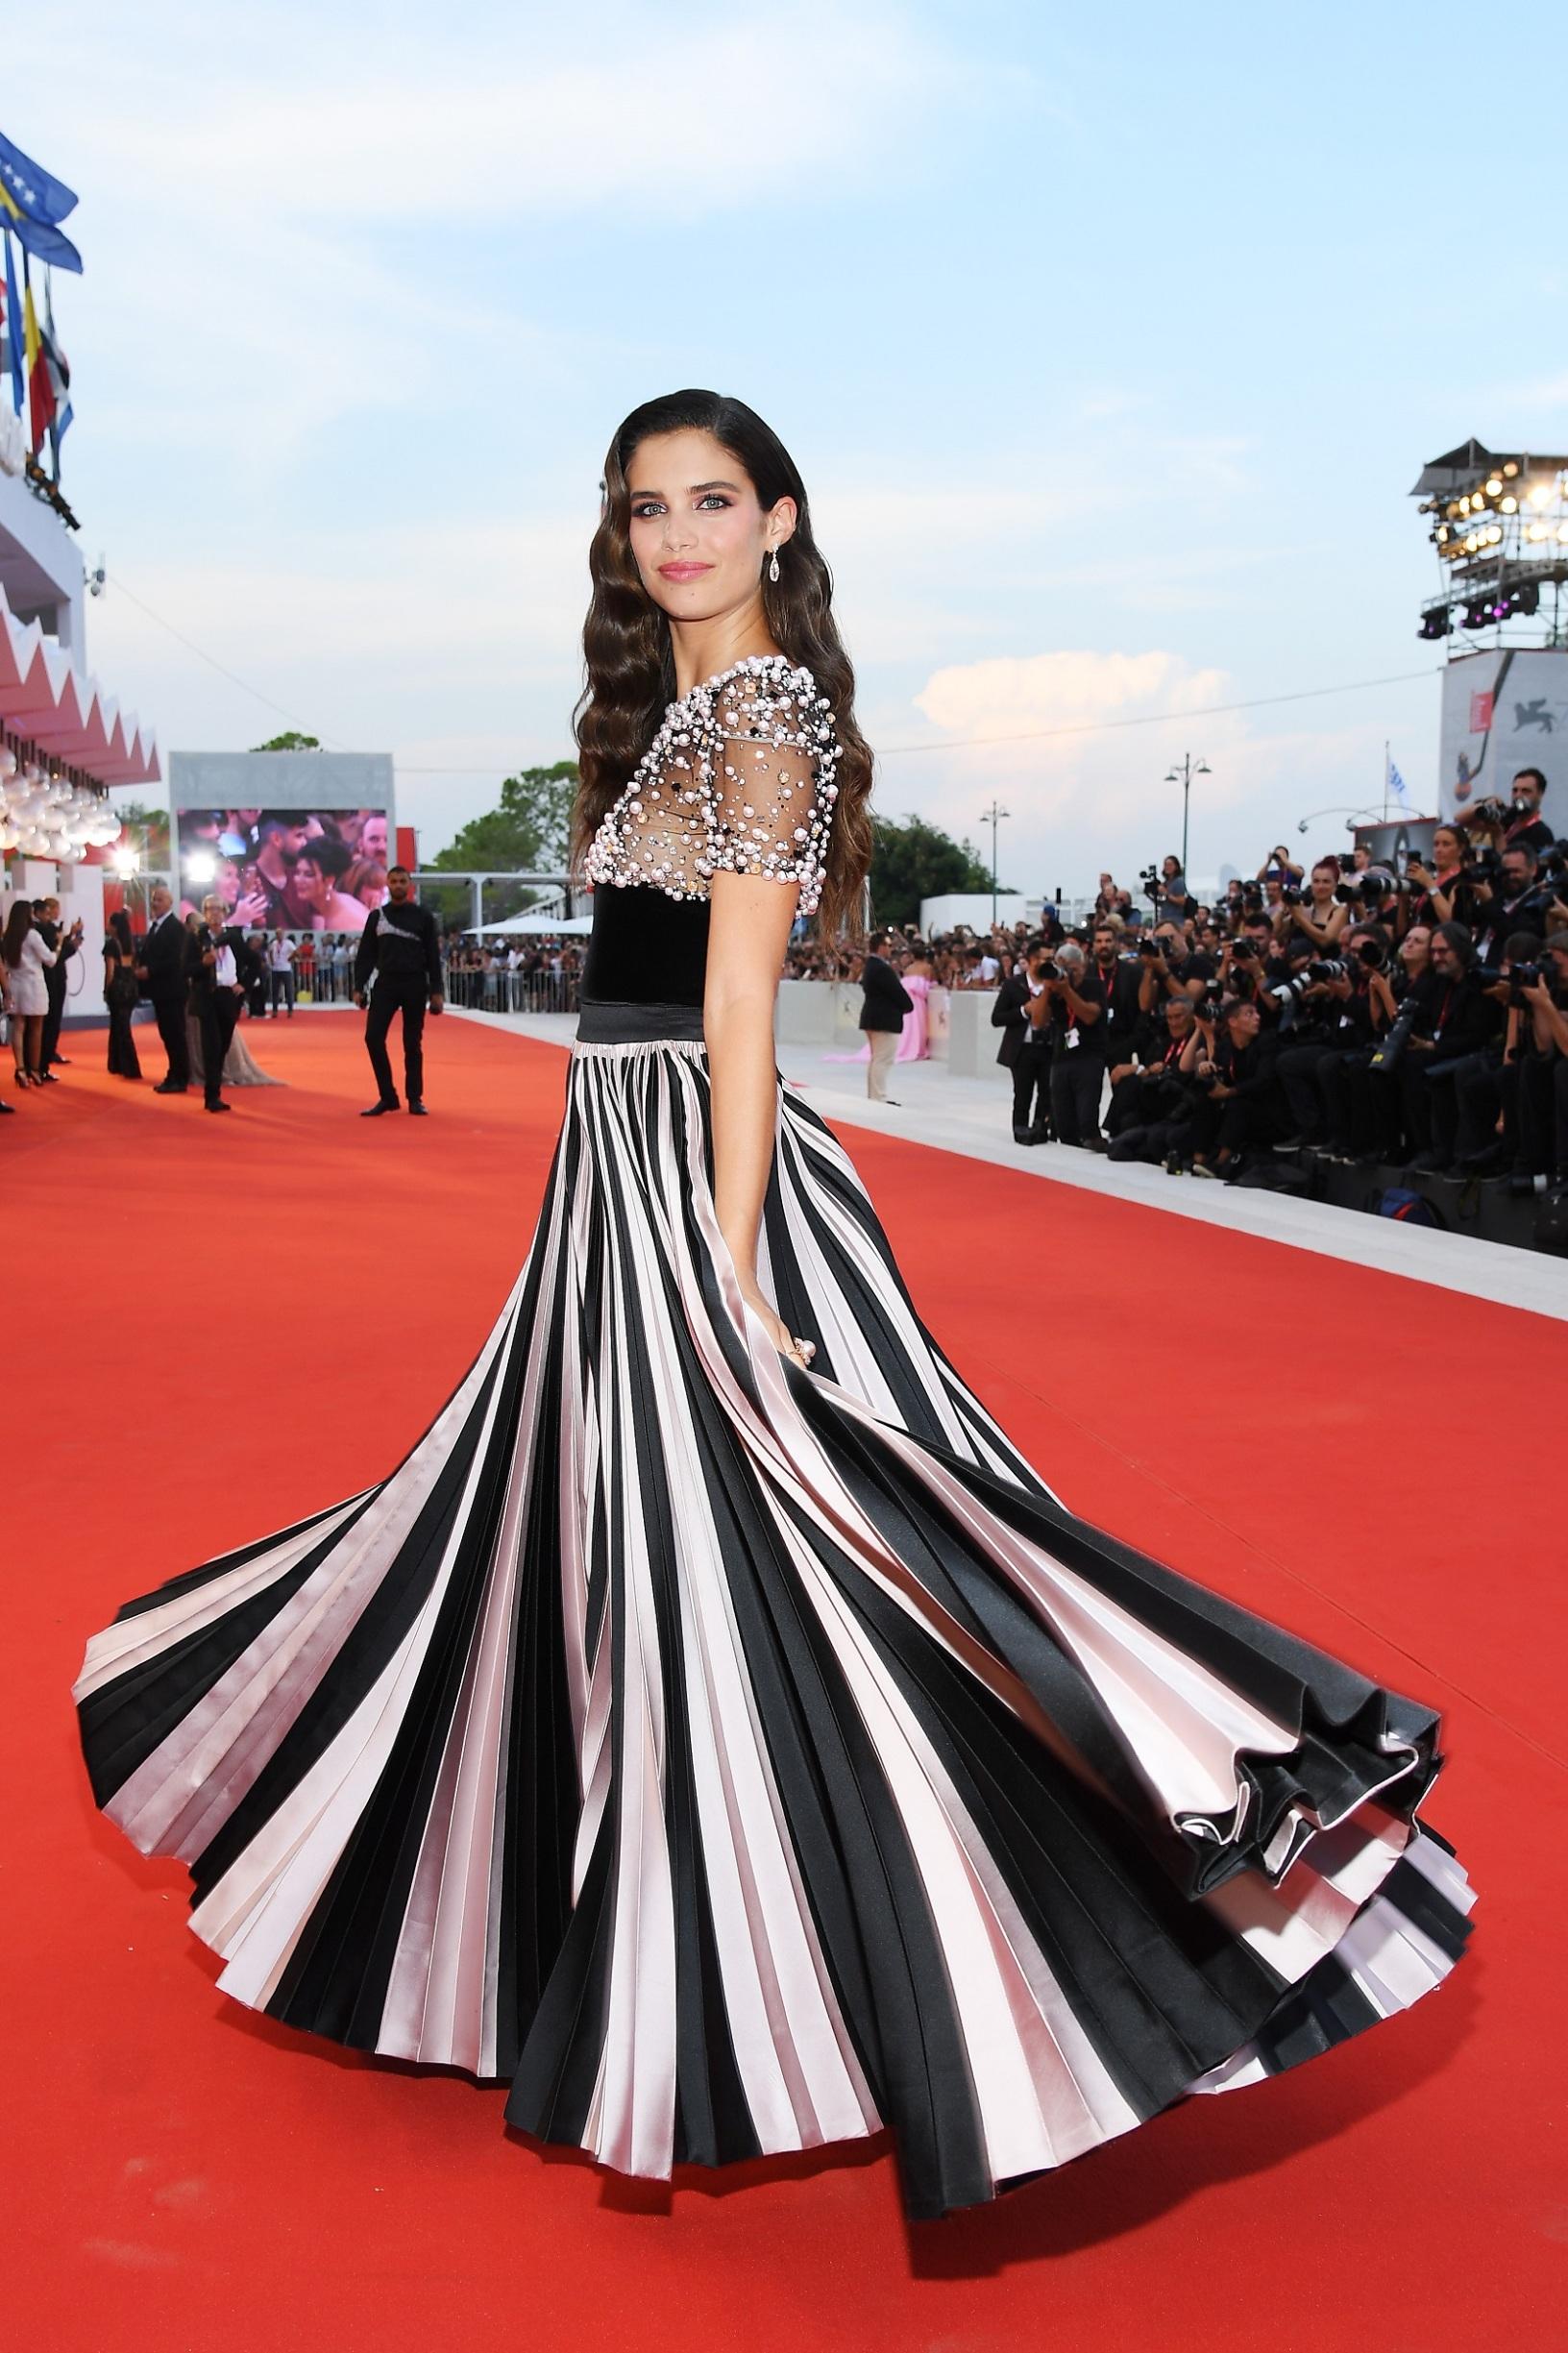 VENICE, ITALY - AUGUST 31: Sara Sampaio walks the red carpet ahead of the